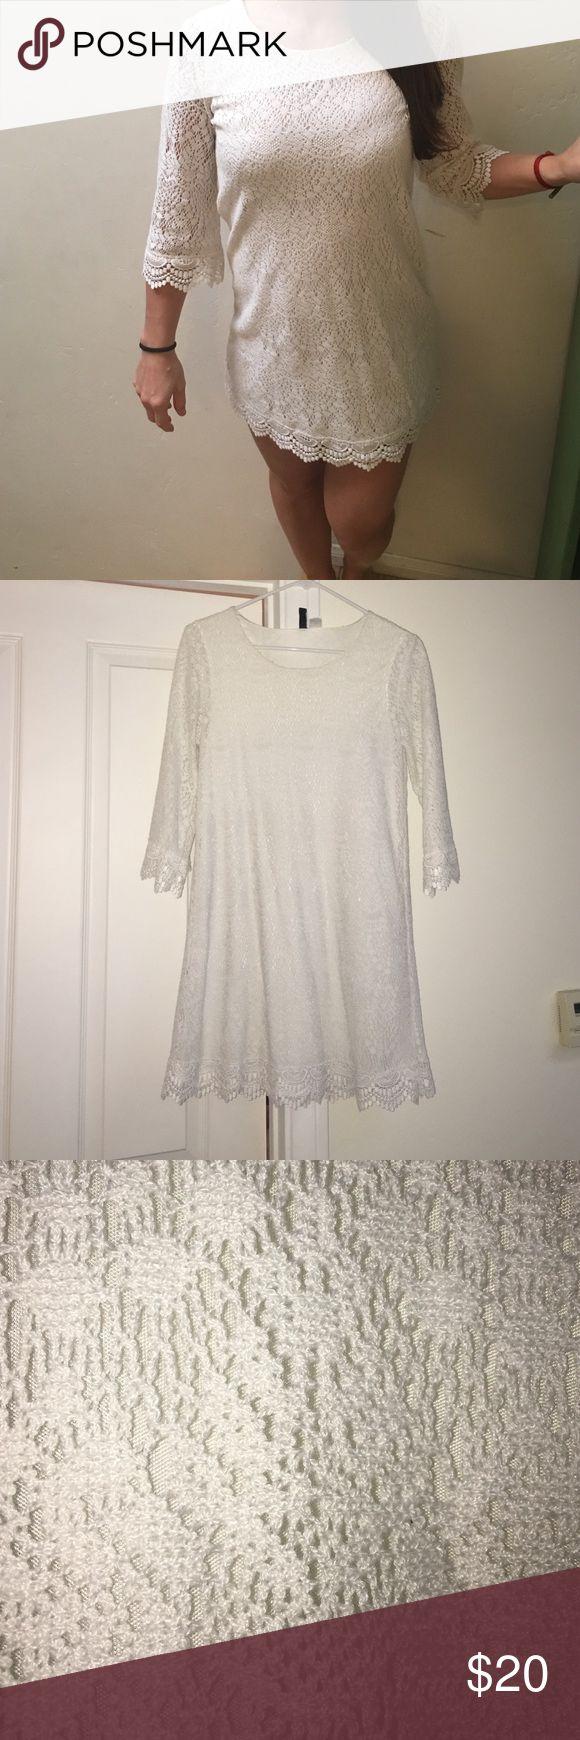 White crochet mini dress 3/4 sleeve white crochet mini dress from H&M. Size 6 US. Super cute alone or with leggings. Worn once. H&M Dresses Mini